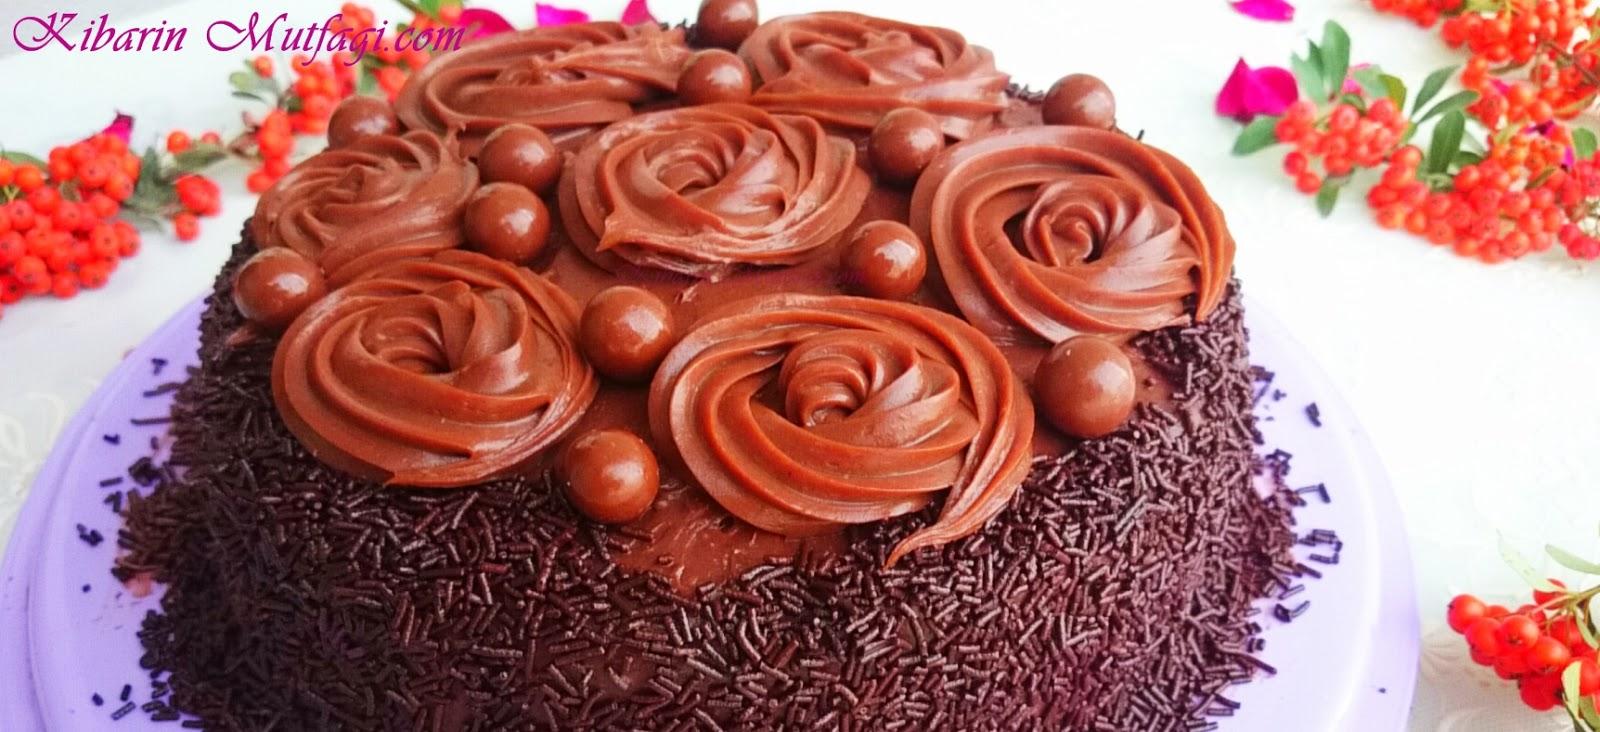 Çikolatalı Pasta Kreması Tarifi